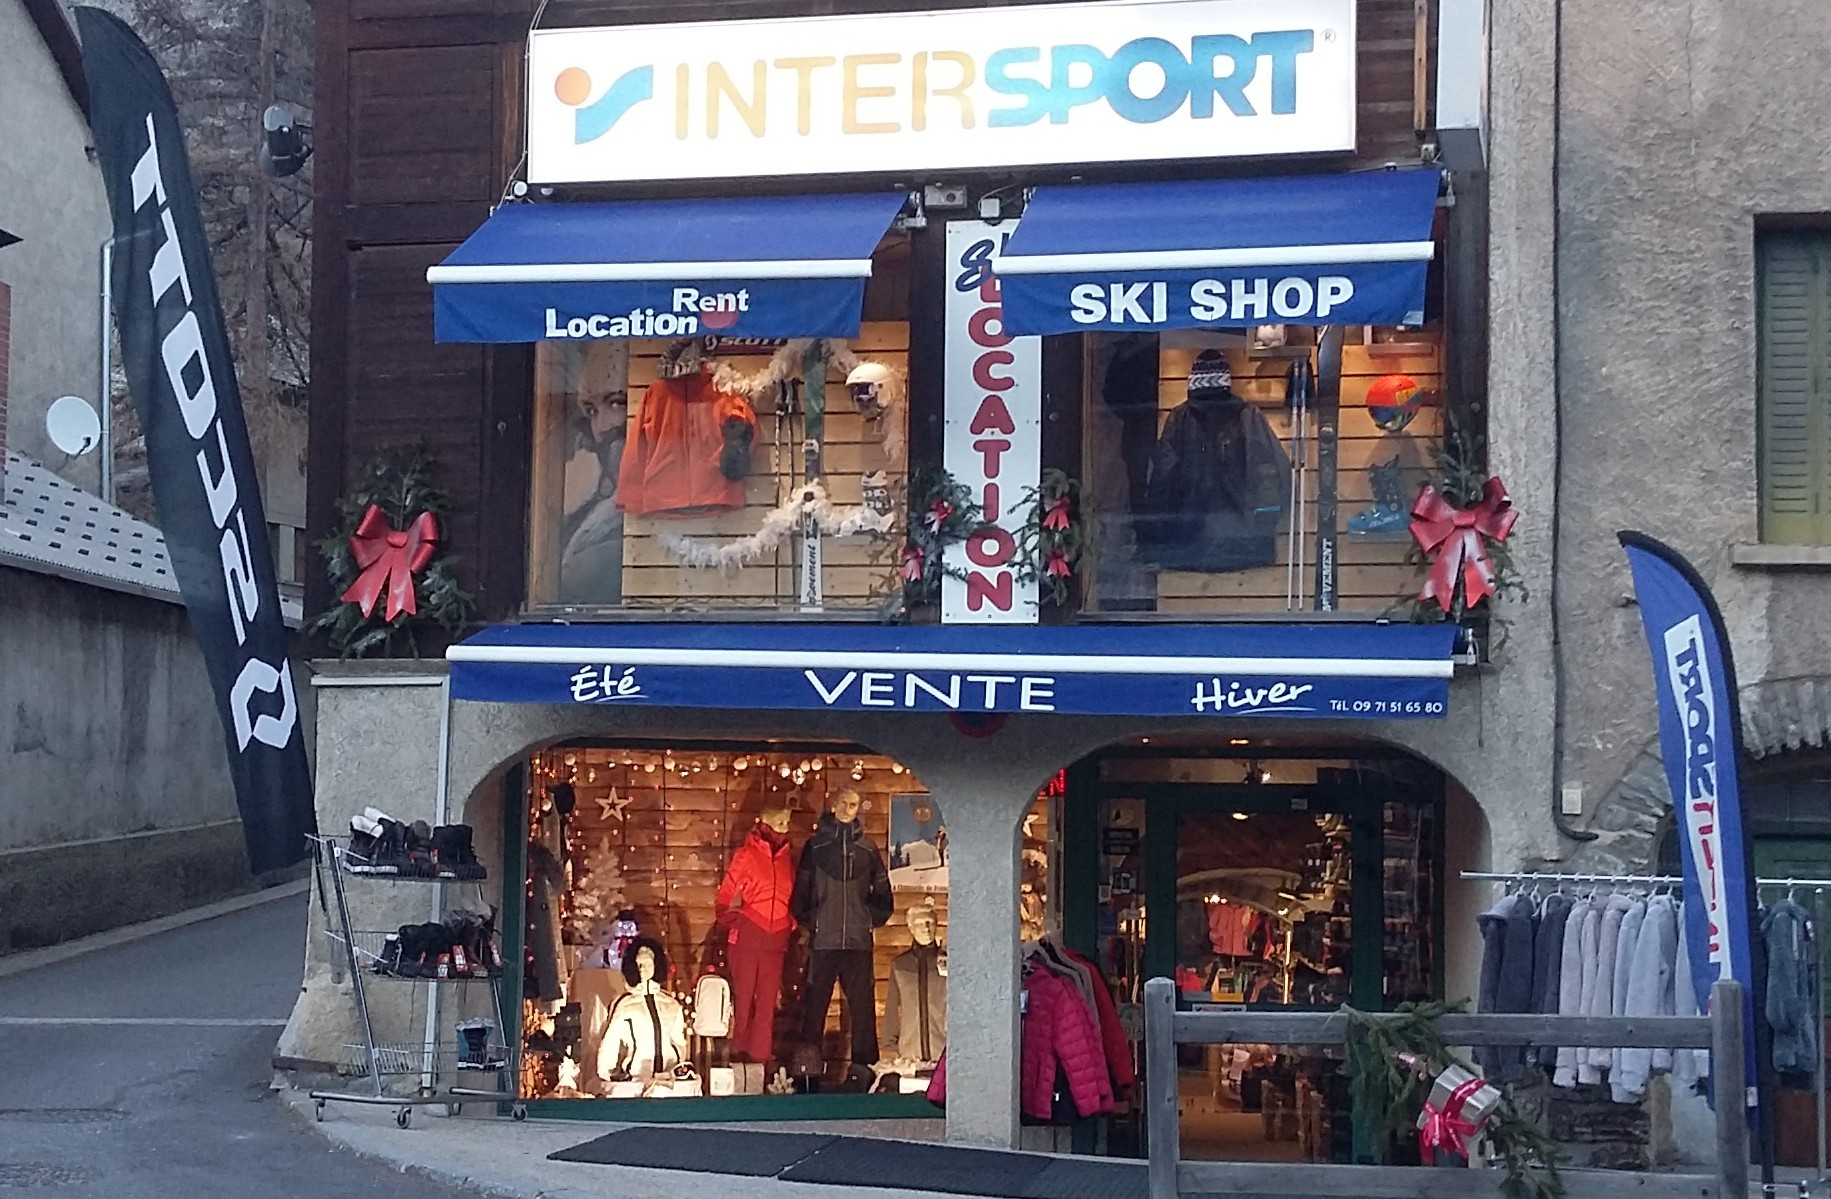 Ski Shop Intersport